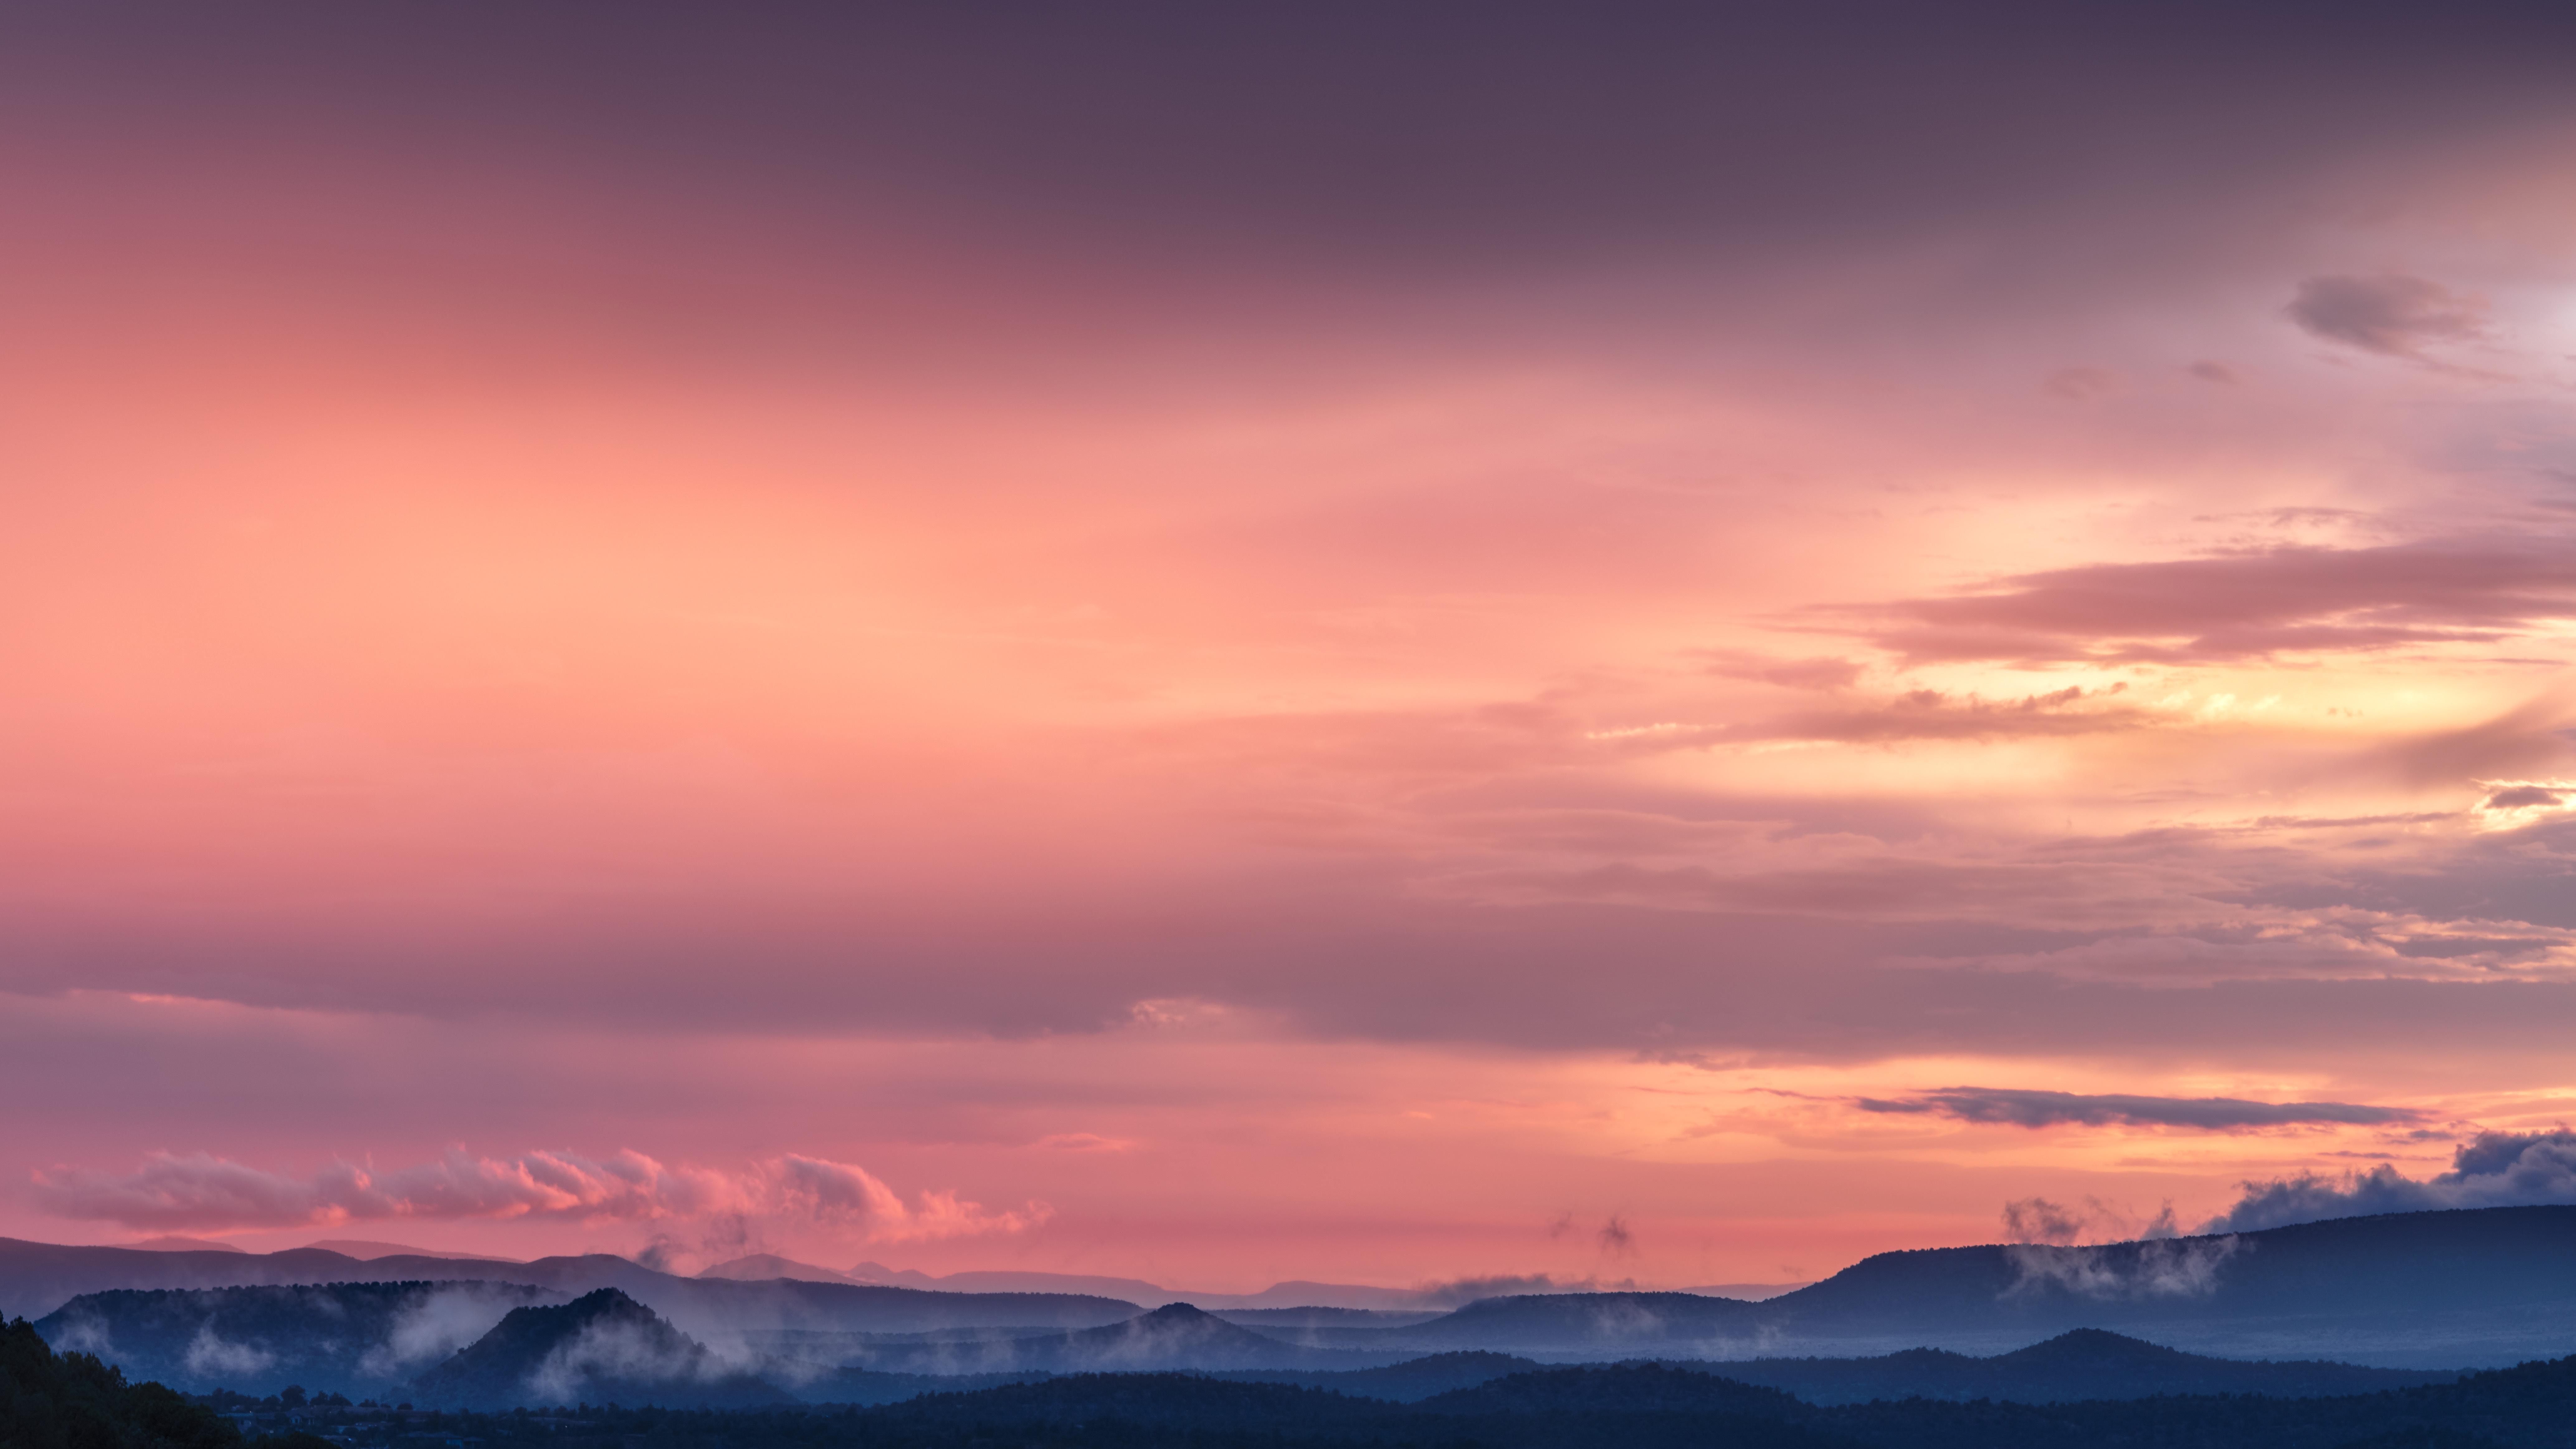 7680x4320 Beautiful Landscape Sunset 8k 8k HD 4k ...